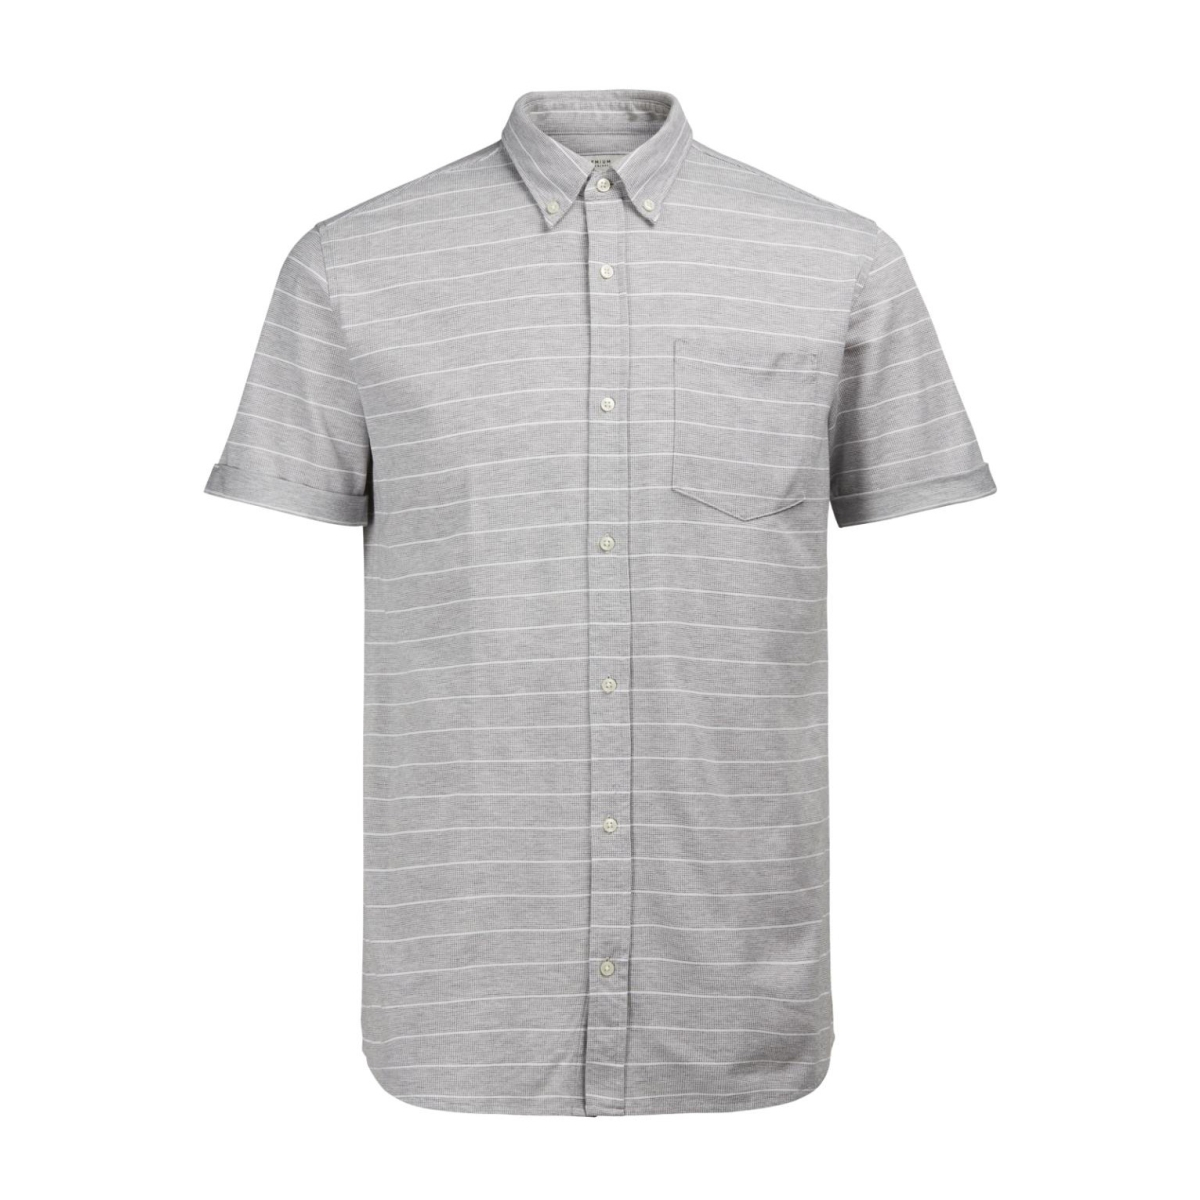 jpraldgate shirt s/s 12120499 jack & jones overhemd light grey mela/slim fit